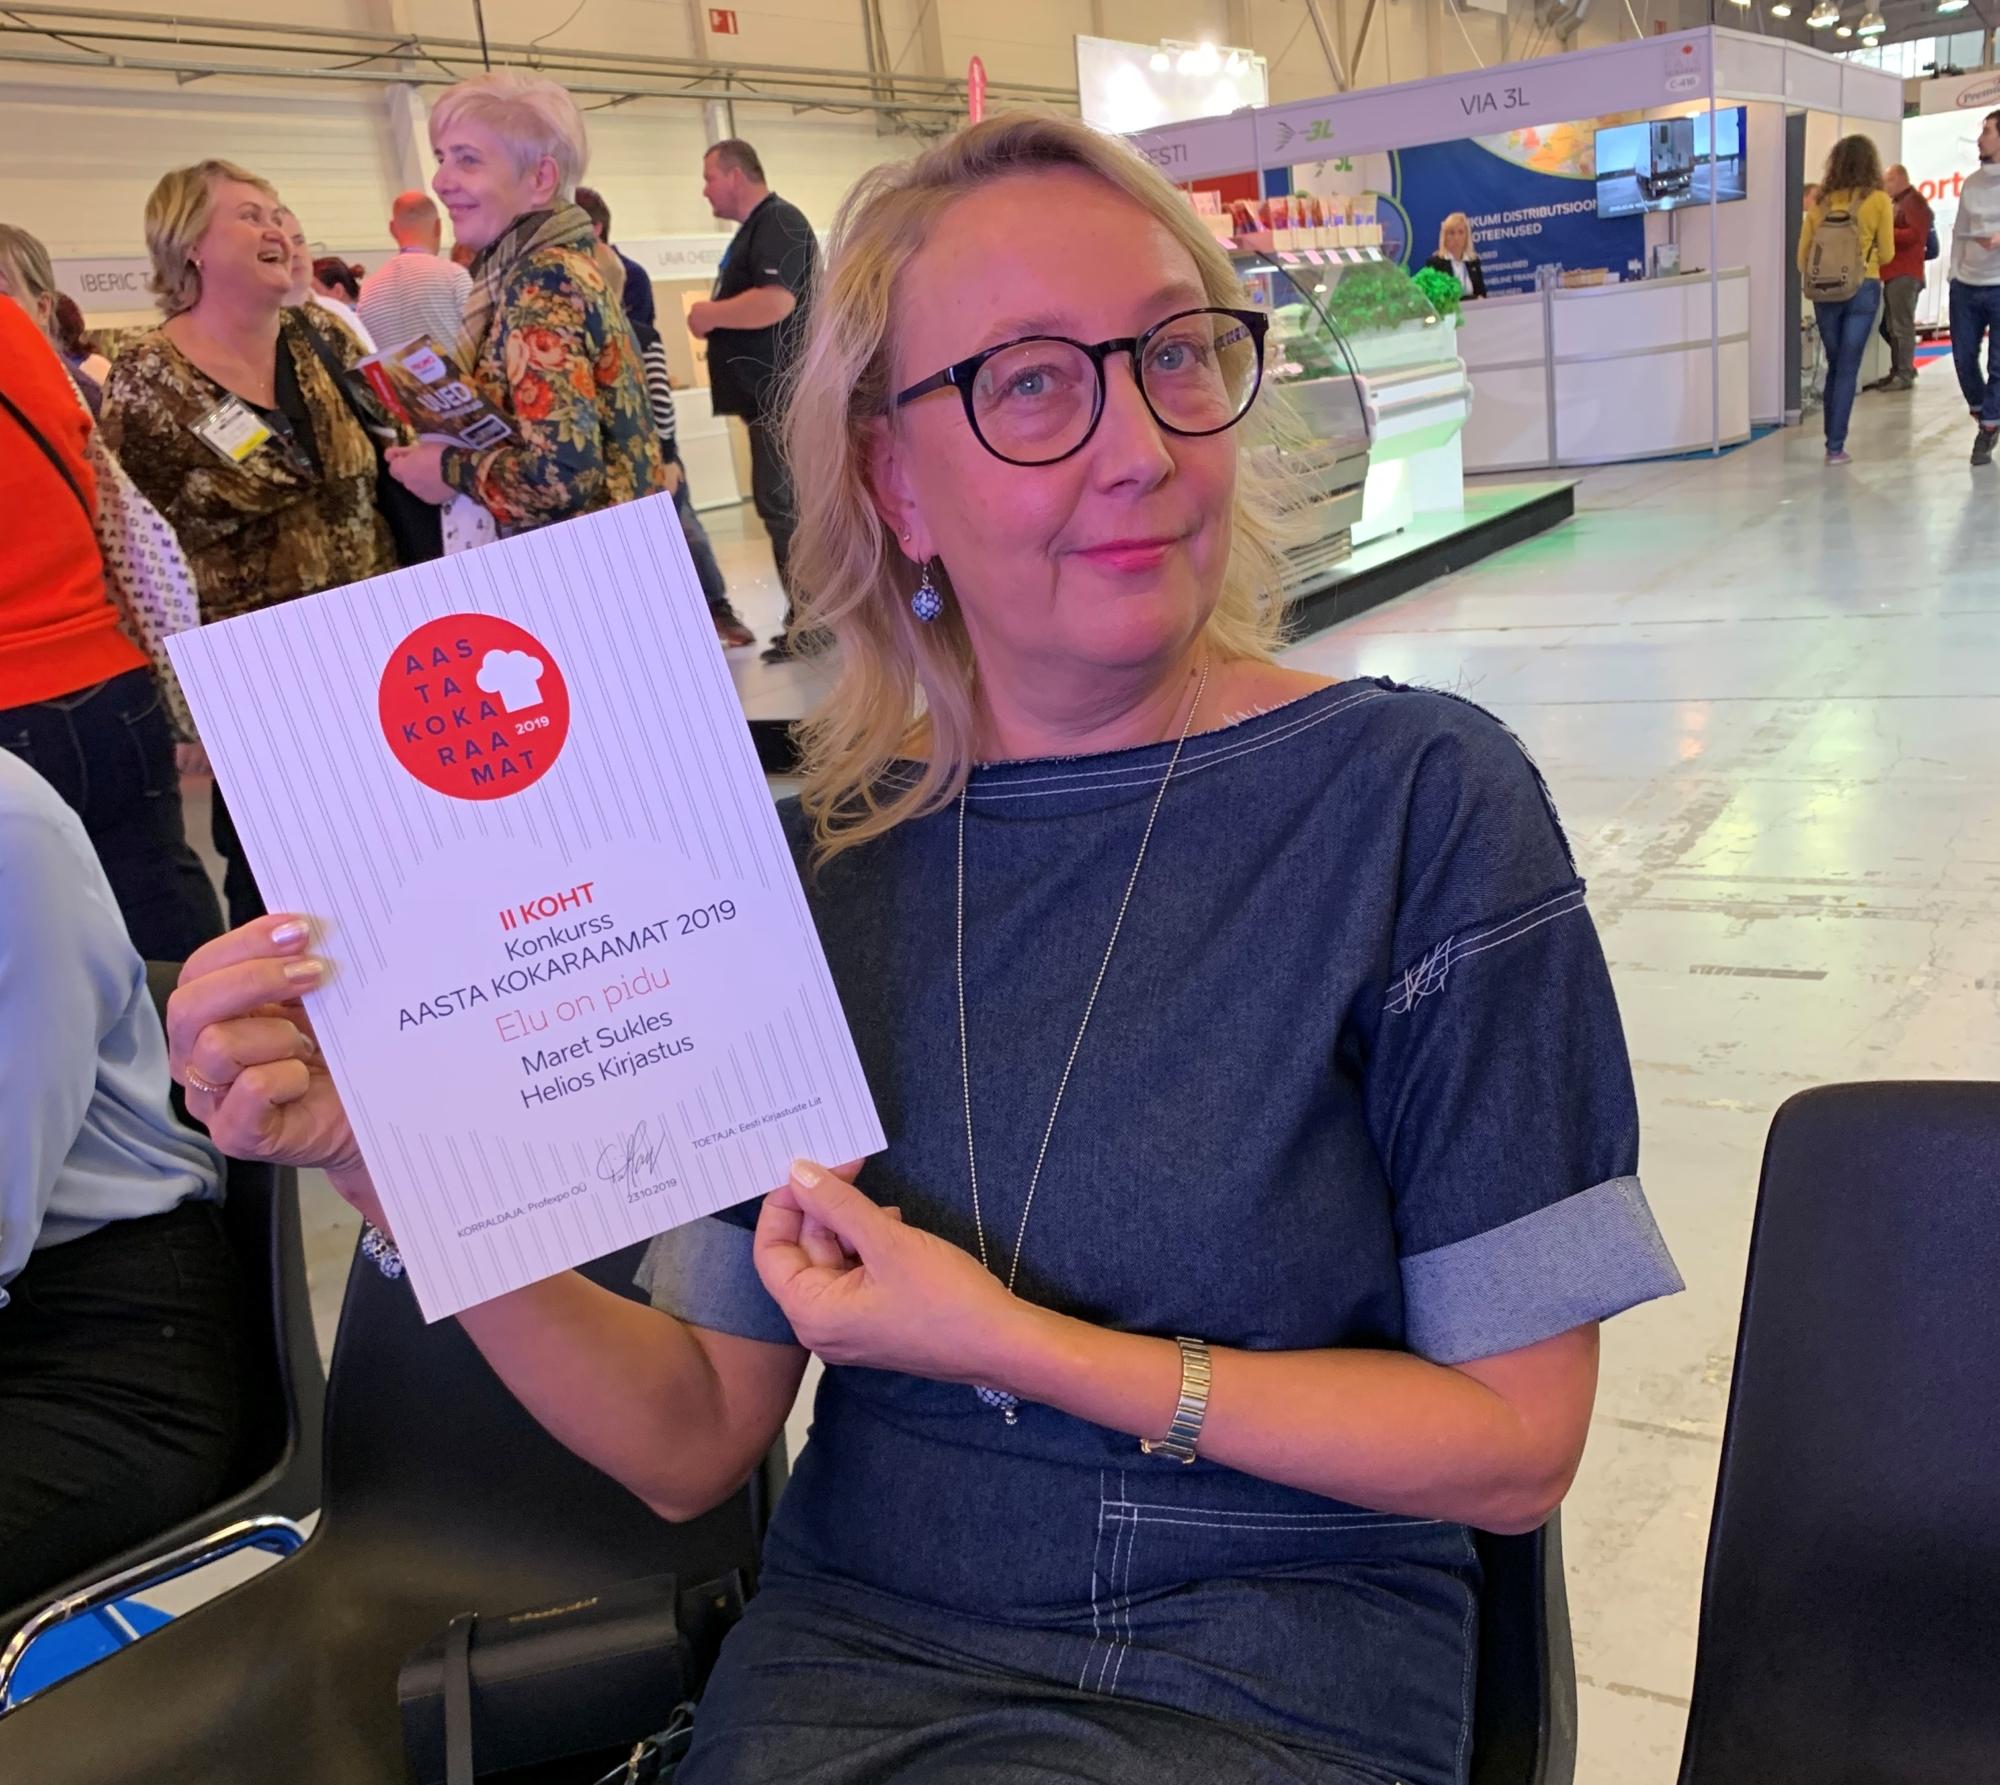 Maret Suklese kokaraamat sai aasta kokaraamatu konkursil  teise koha